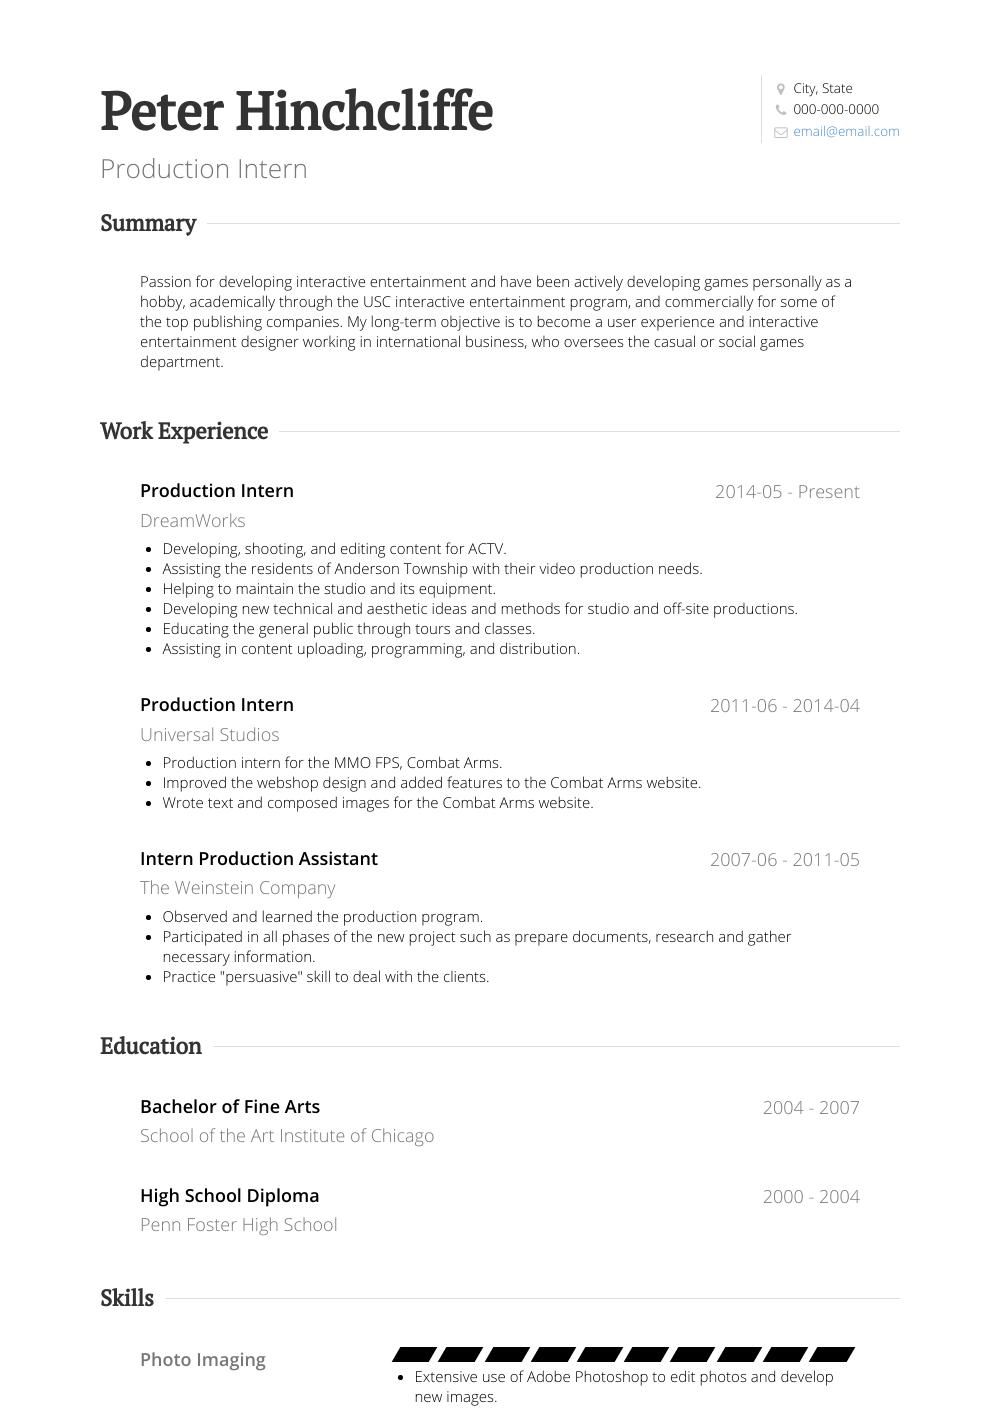 resume for publishing internship